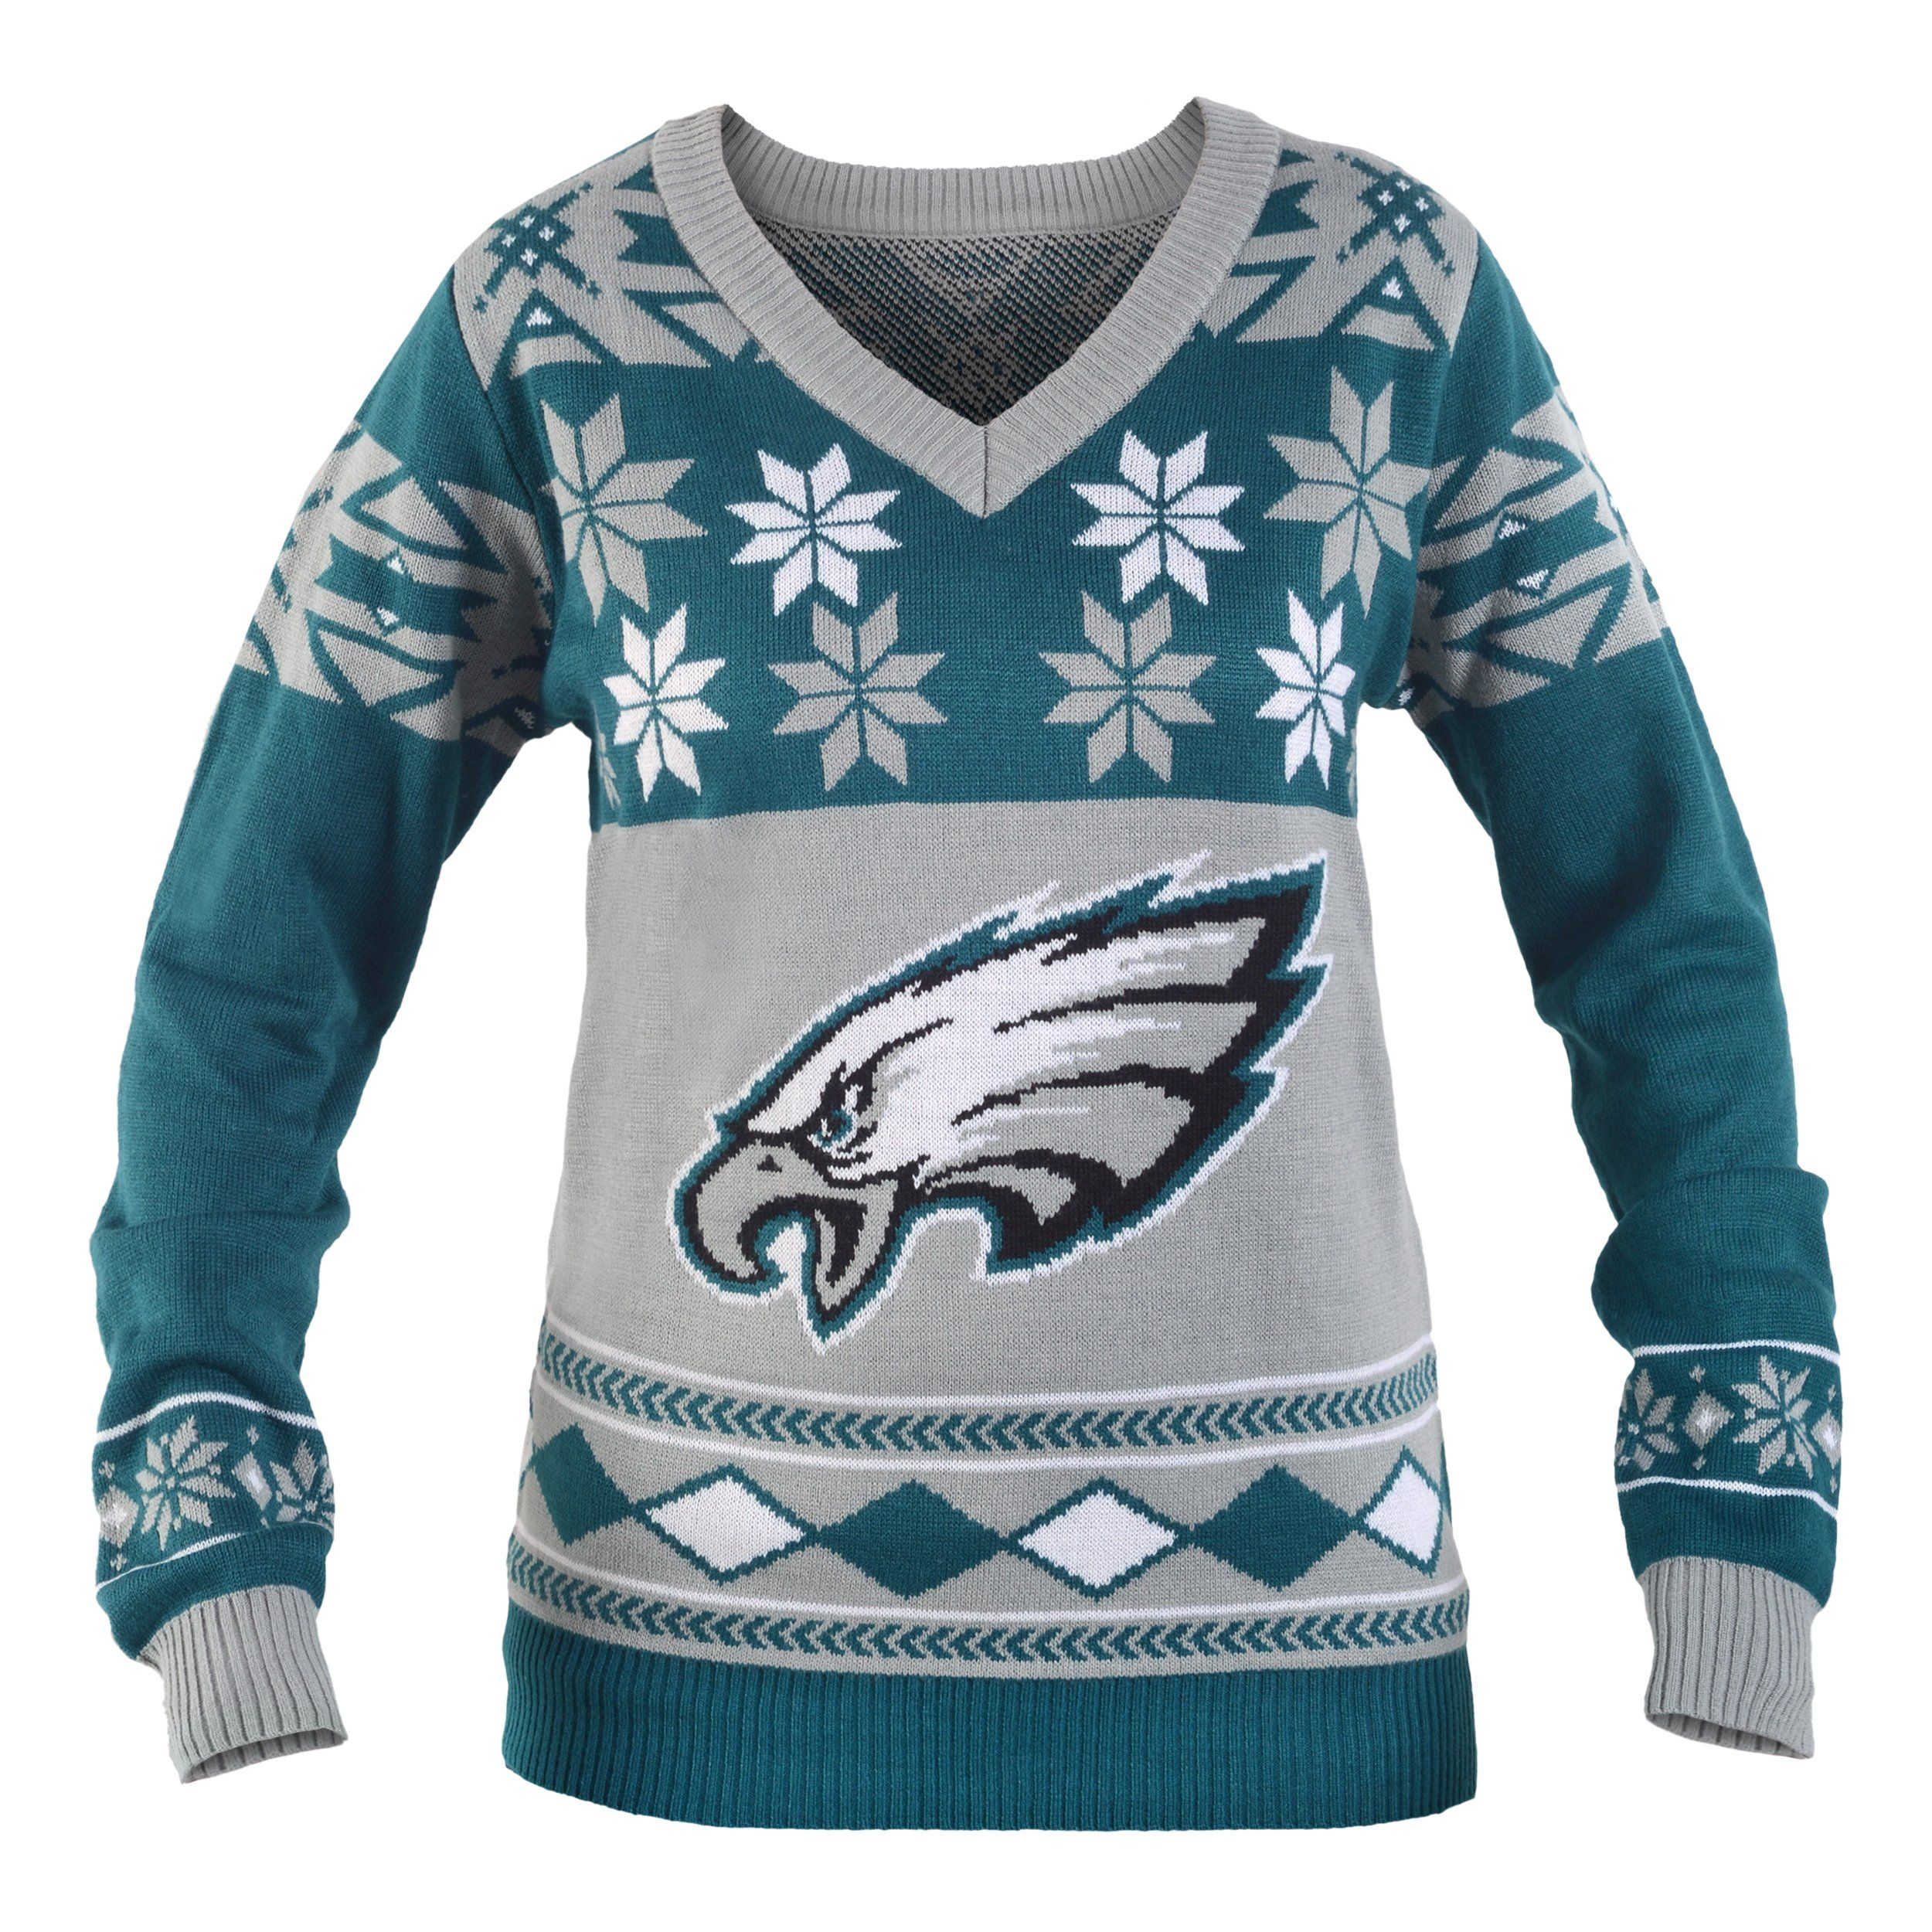 Philadelphia Eagles Ugly Christmas Sweaters | H-Football ...